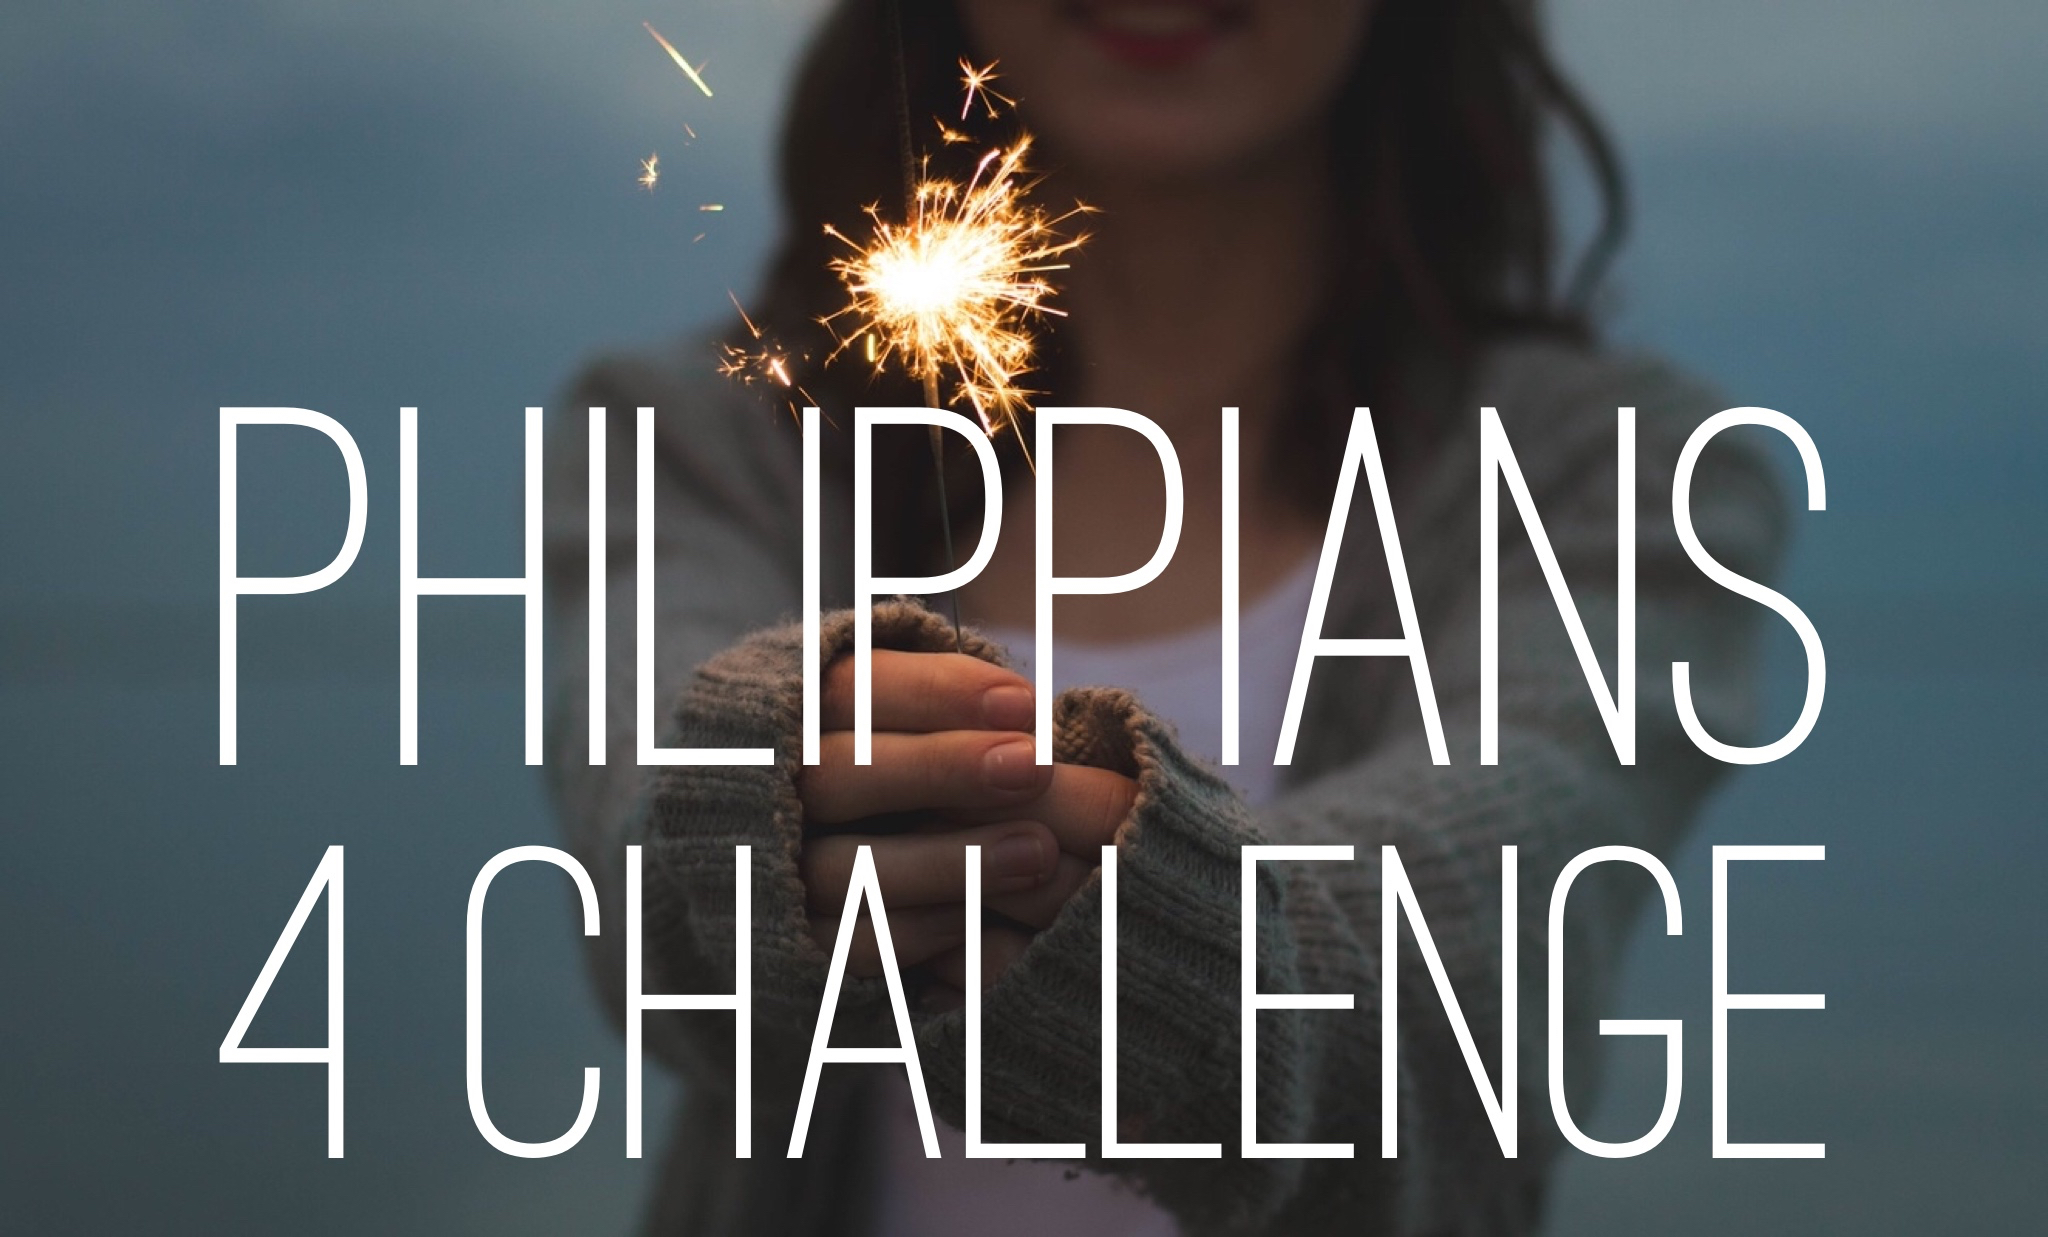 Philippians 4 Challenge.jpg